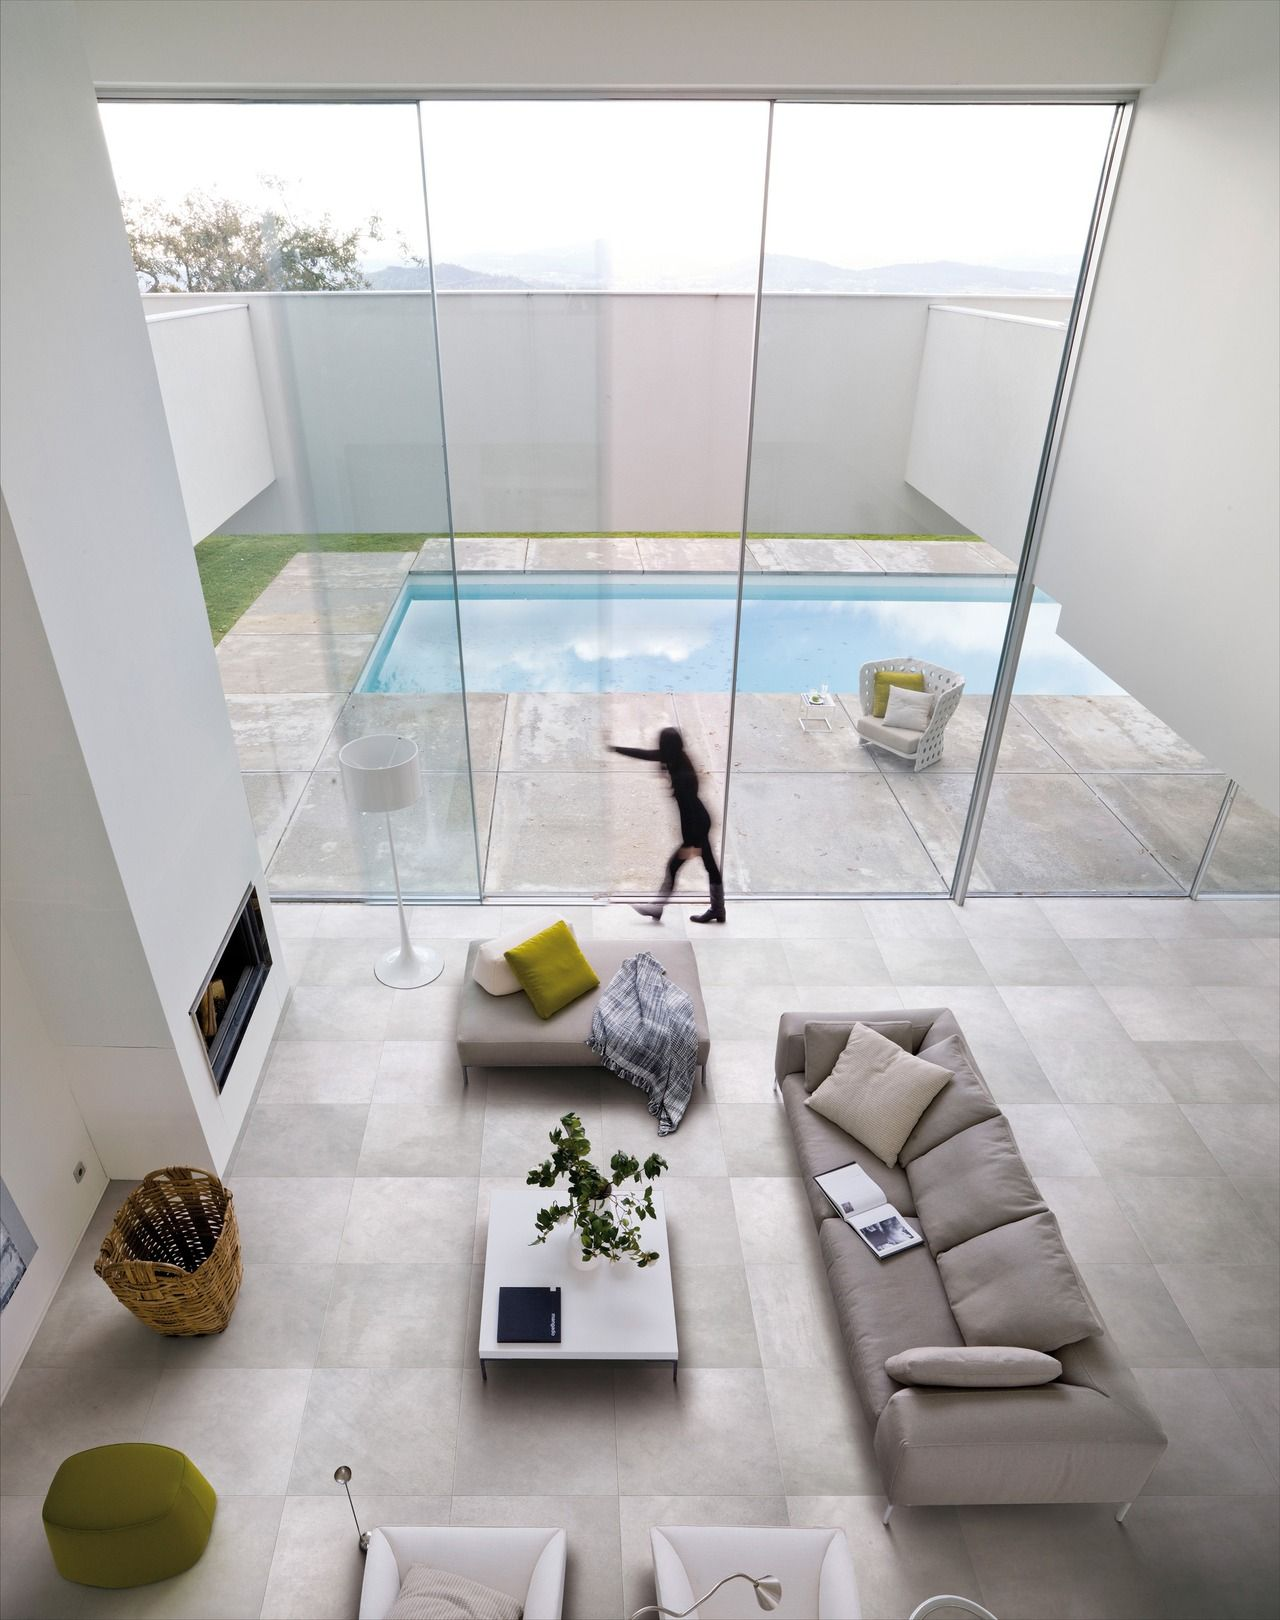 Home interior jesus topos atelier de arquitectura casa bom jesus braga portugal